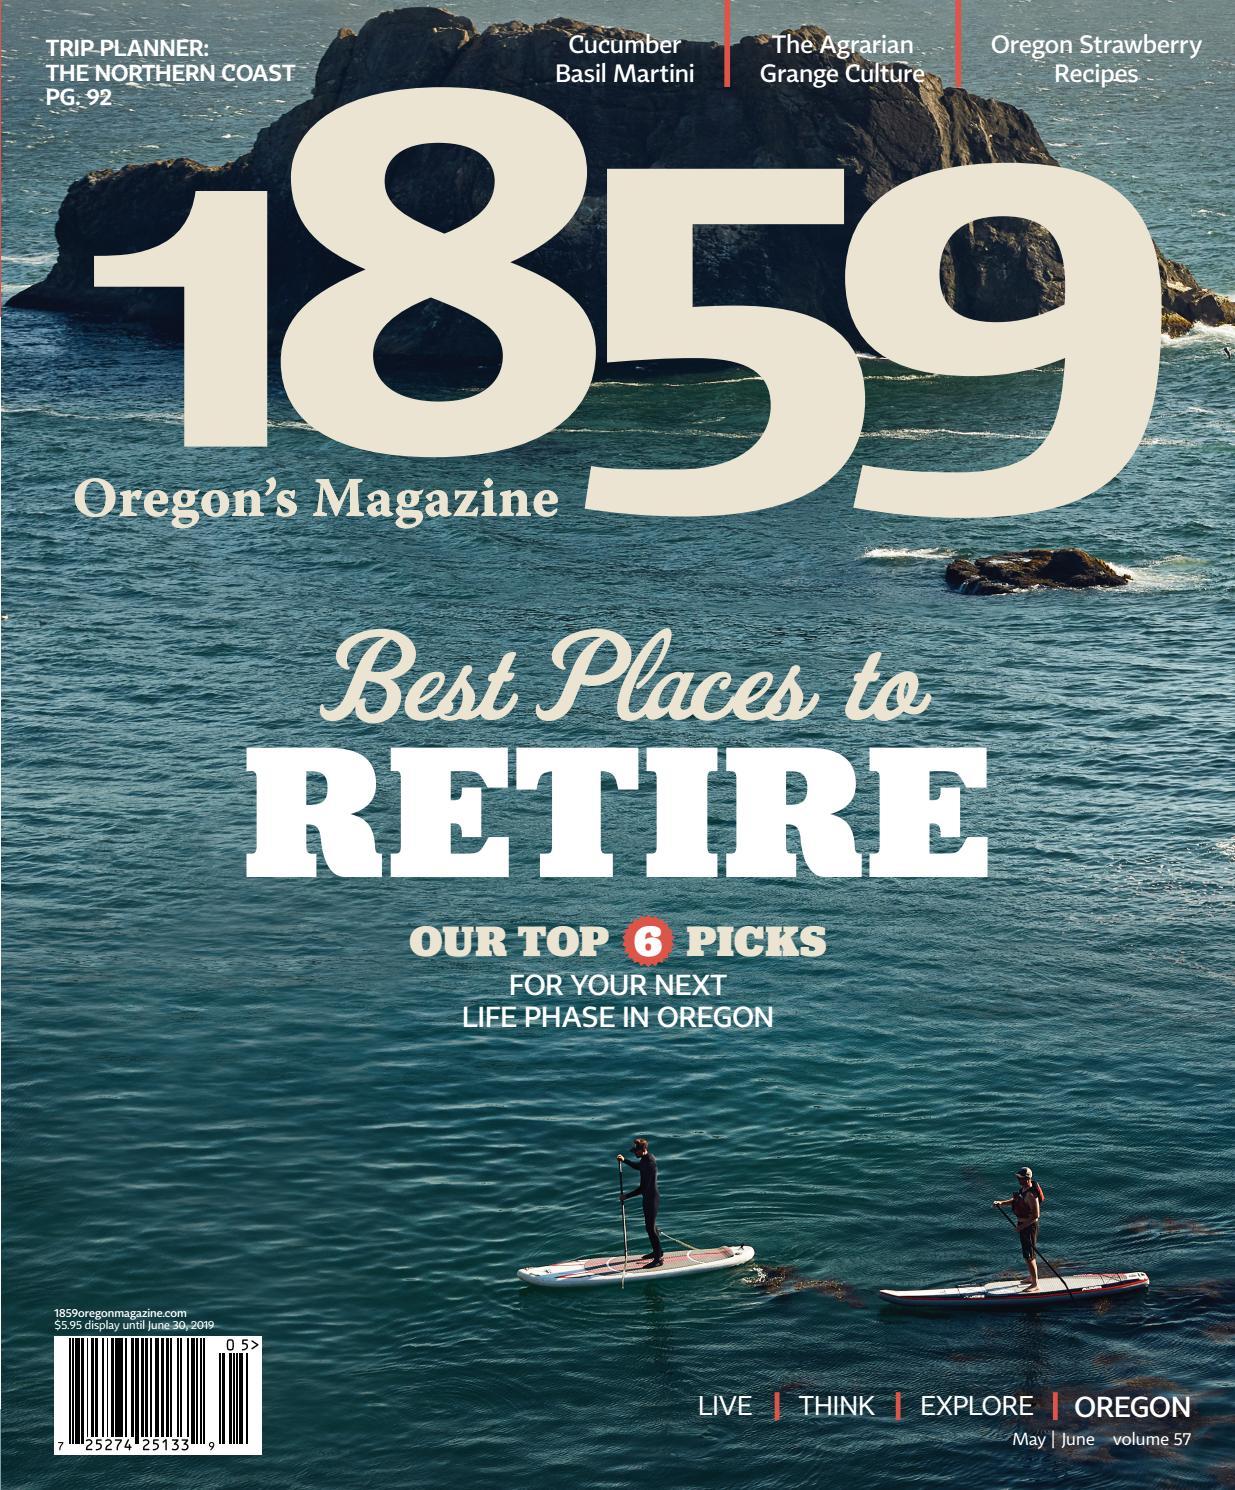 1859 Oregon's Magazine | May/June 2019 by Statehood Media - issuu